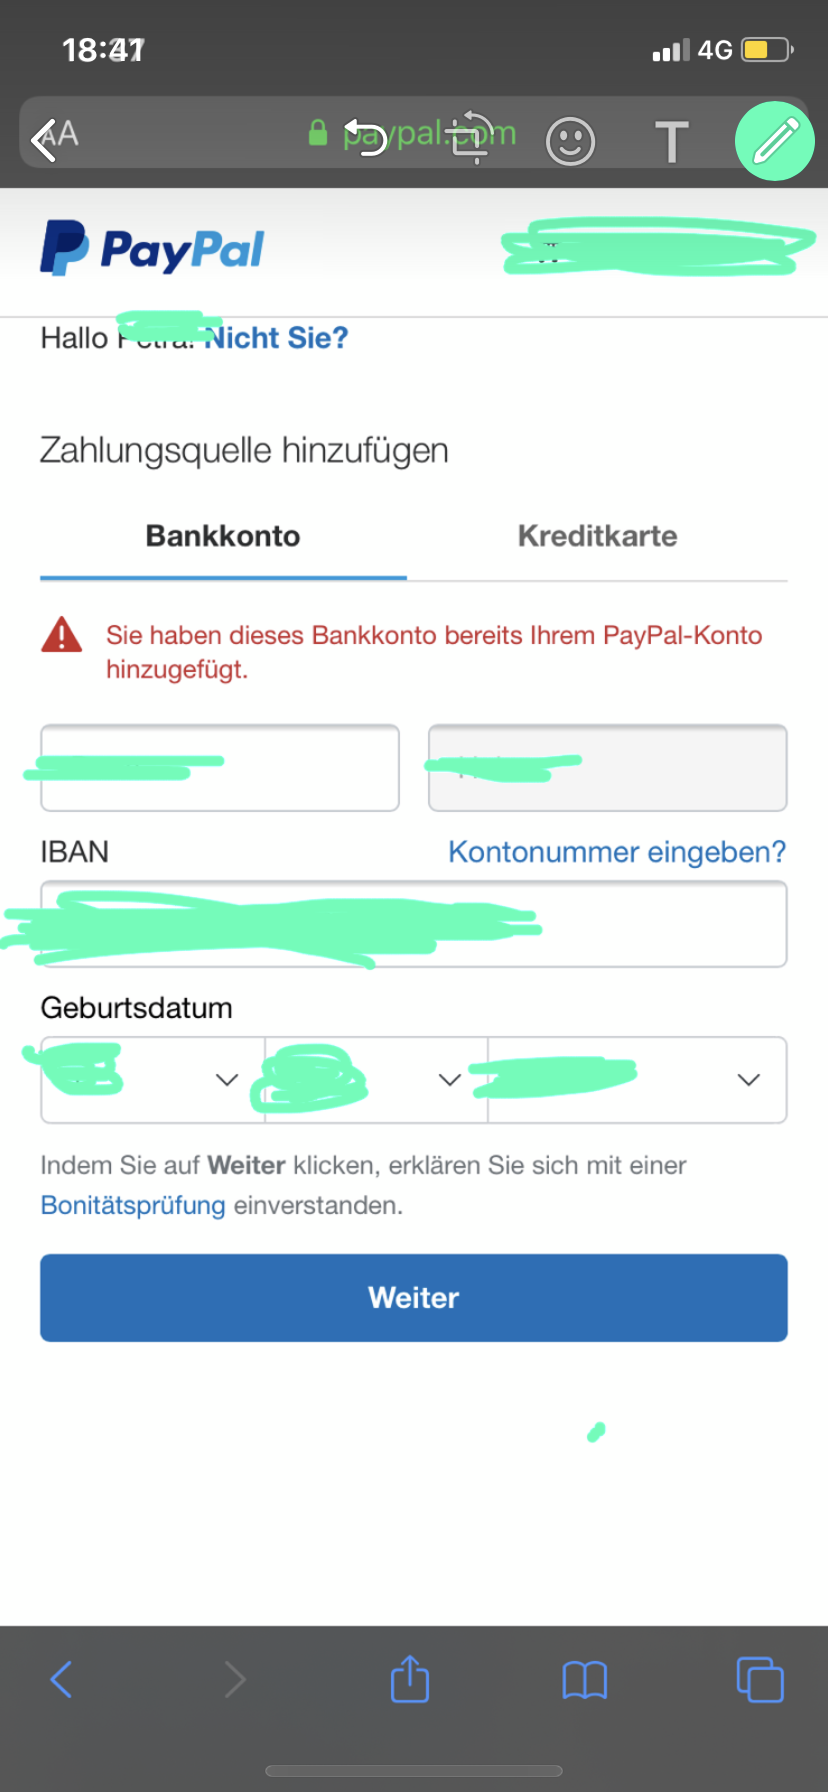 Zahlung An Paypal Konto